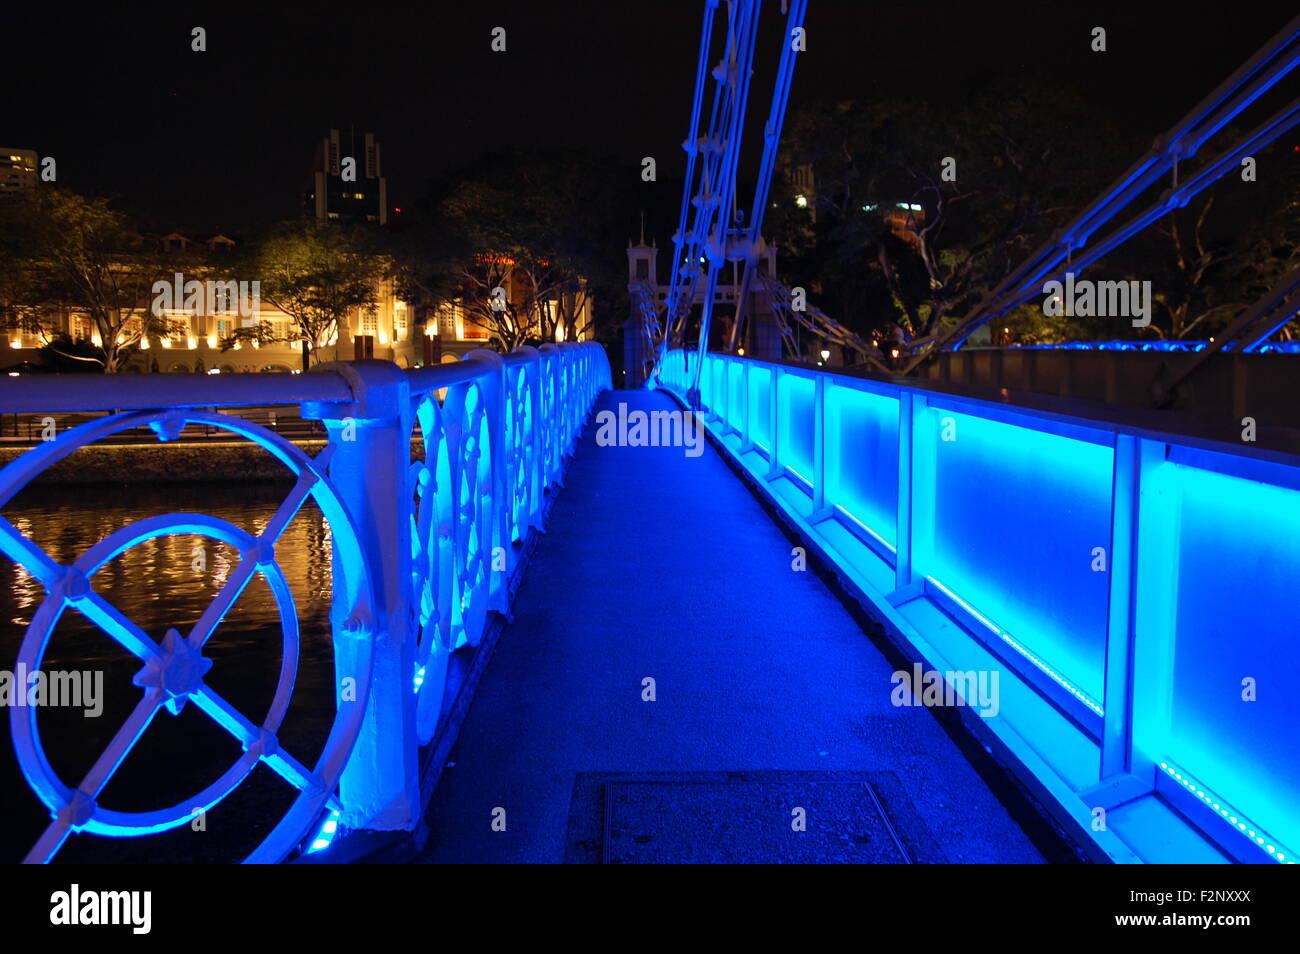 Walkway on the Cavenagh Bridge illuminated blue at night, Singapore - Stock Image